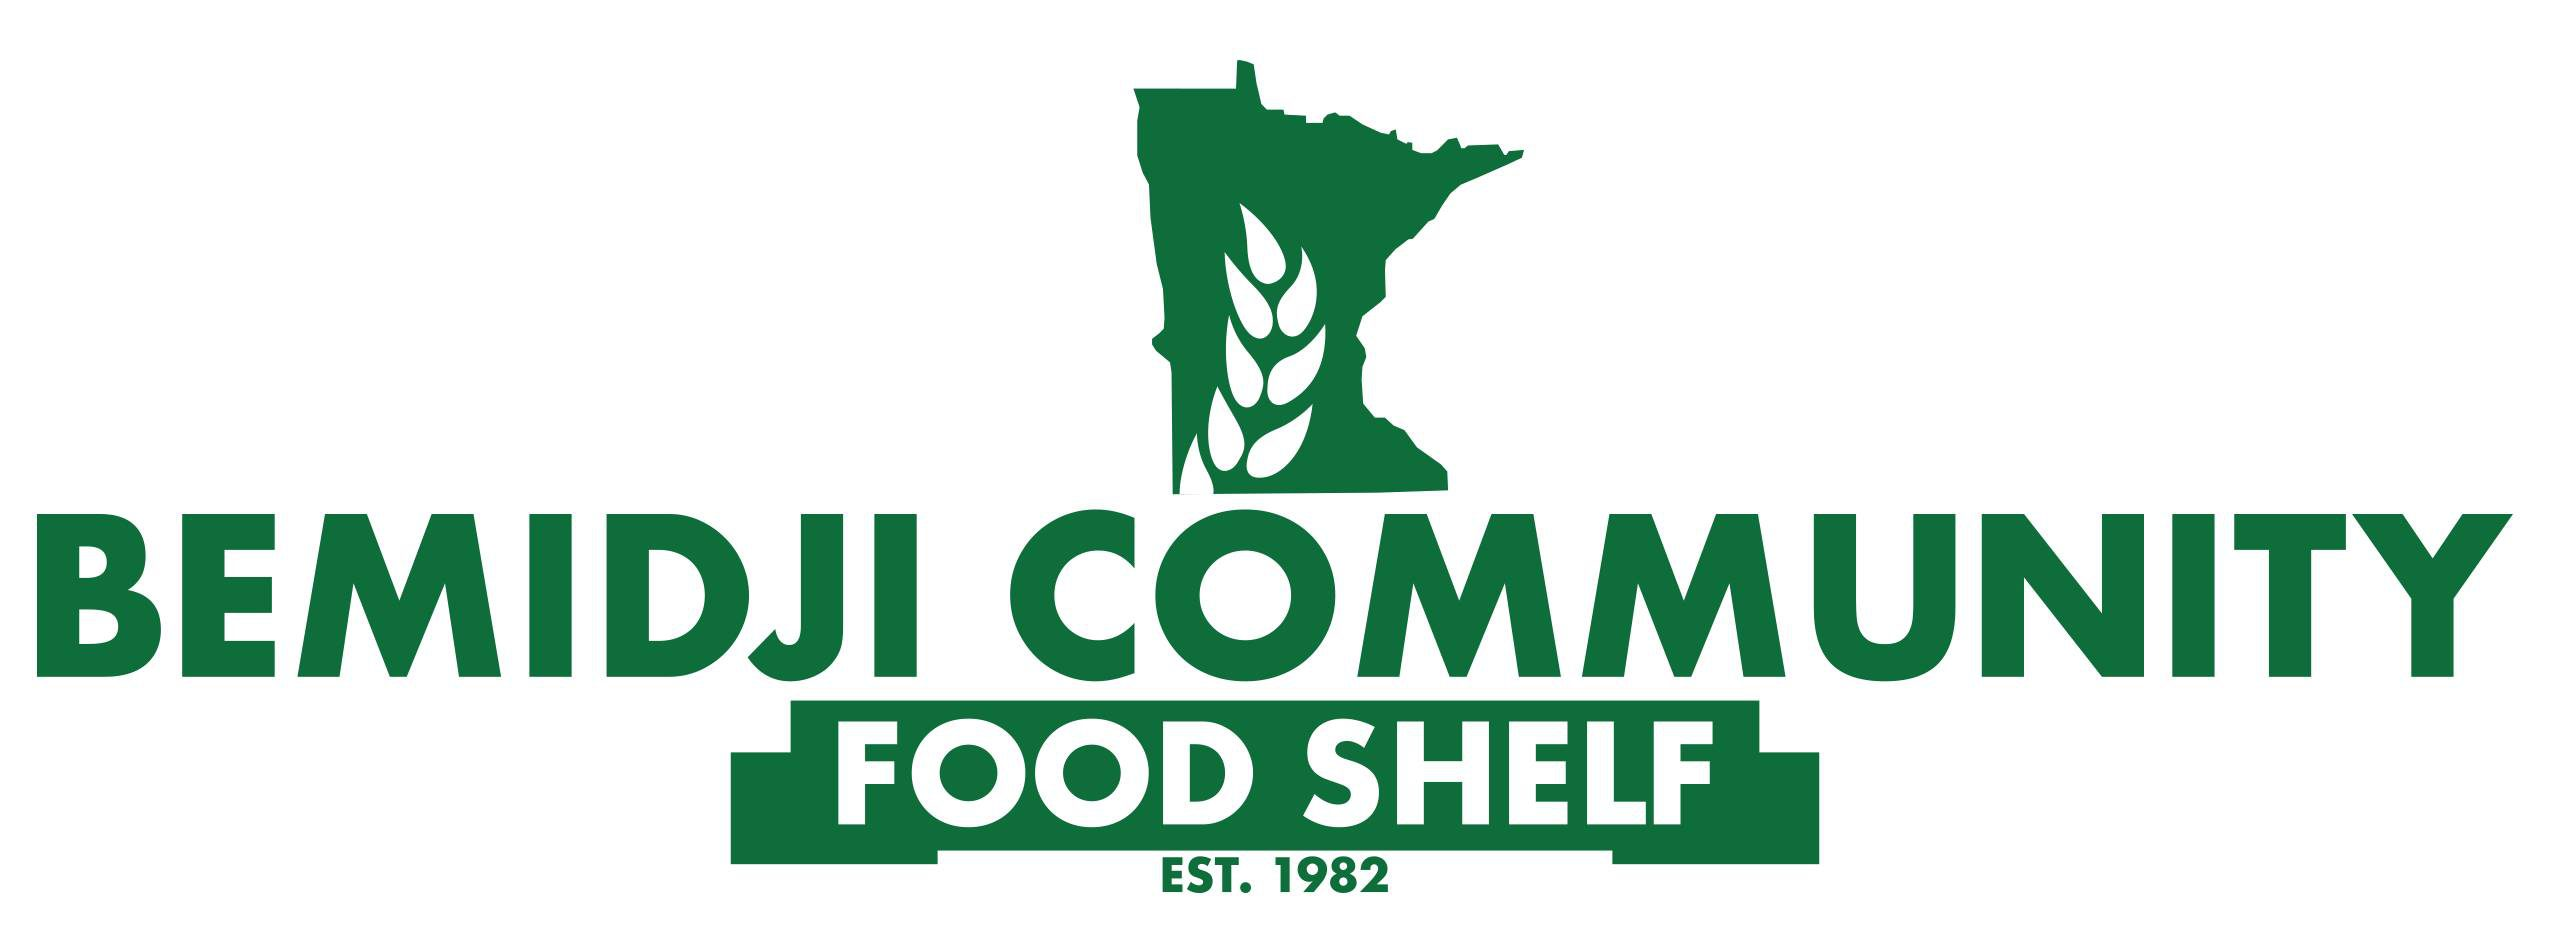 Bemidji Community Food Shelf